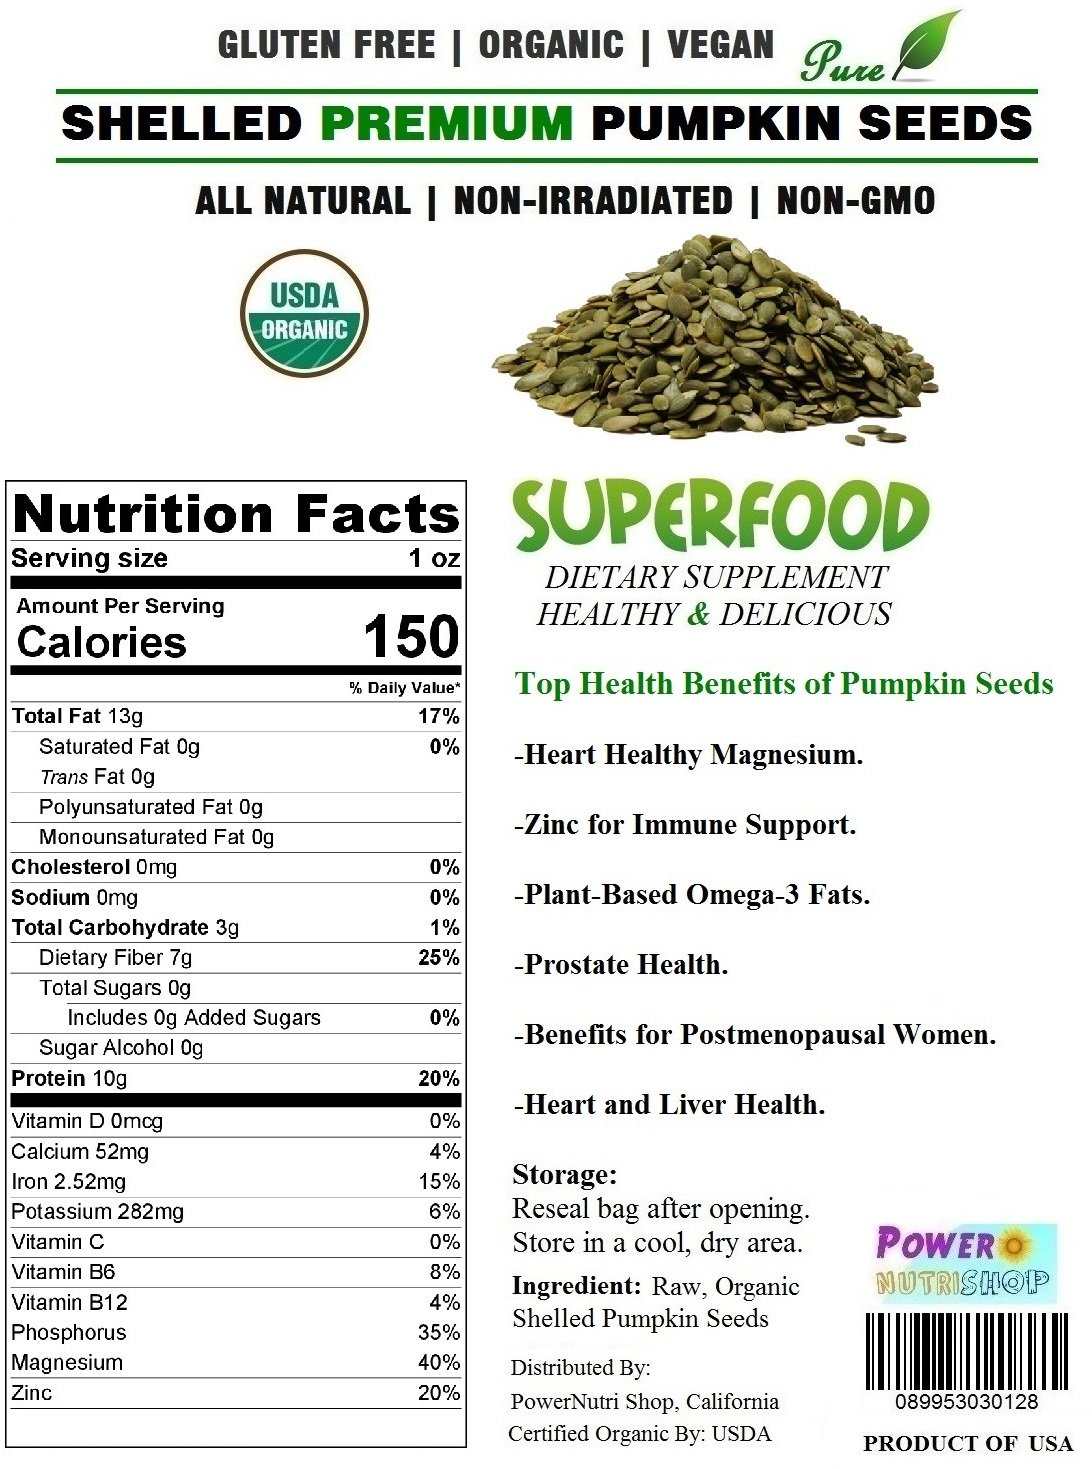 ALL Natural GROWN ORGANICALLY PREMIUM Raw Shelled Pumpkin Seeds,Pepitas, 8 Pounds(128 oz) Bag by PowerNutri Shop